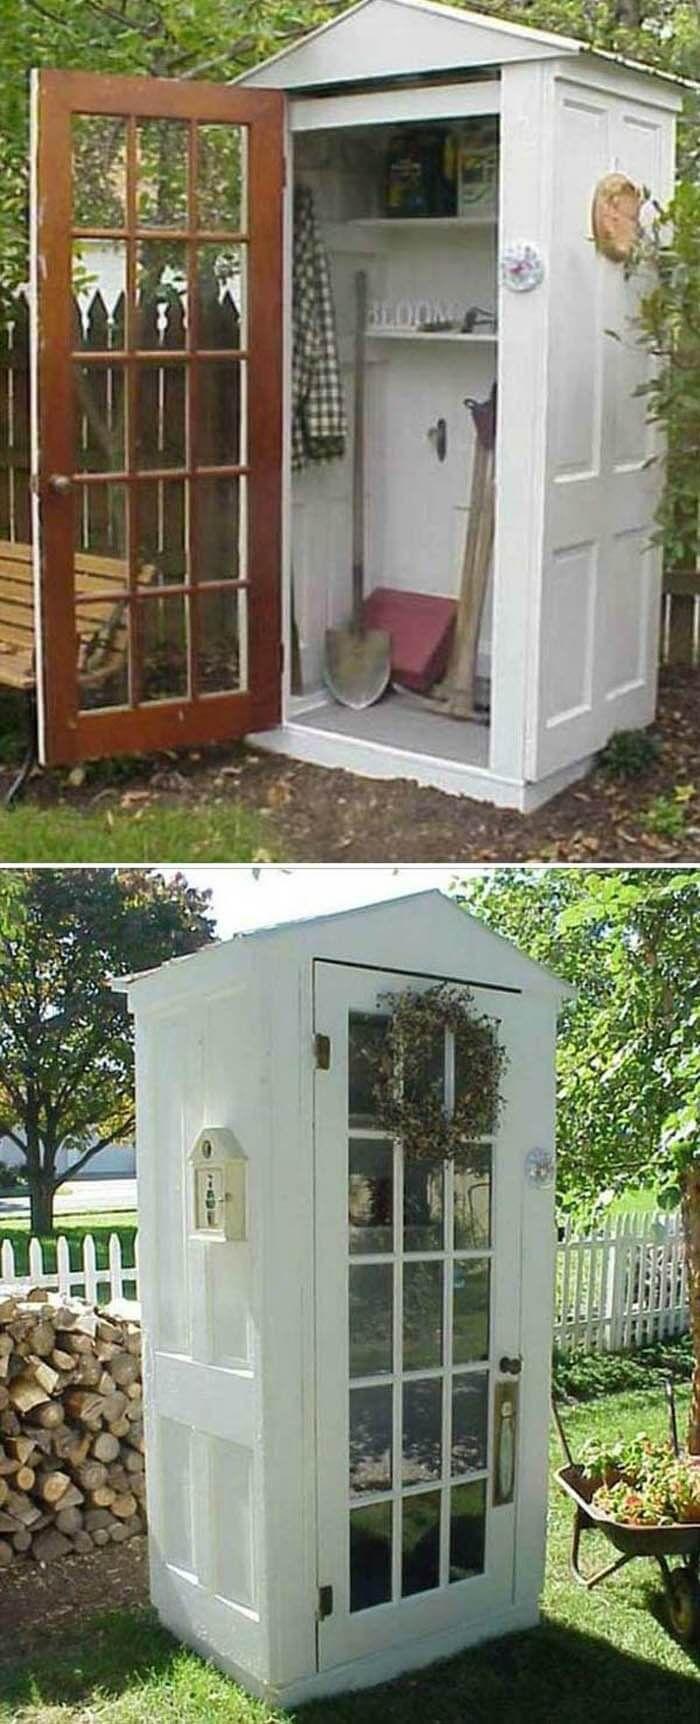 A whimsical boothlike glass door storage shed kesäkeittiö